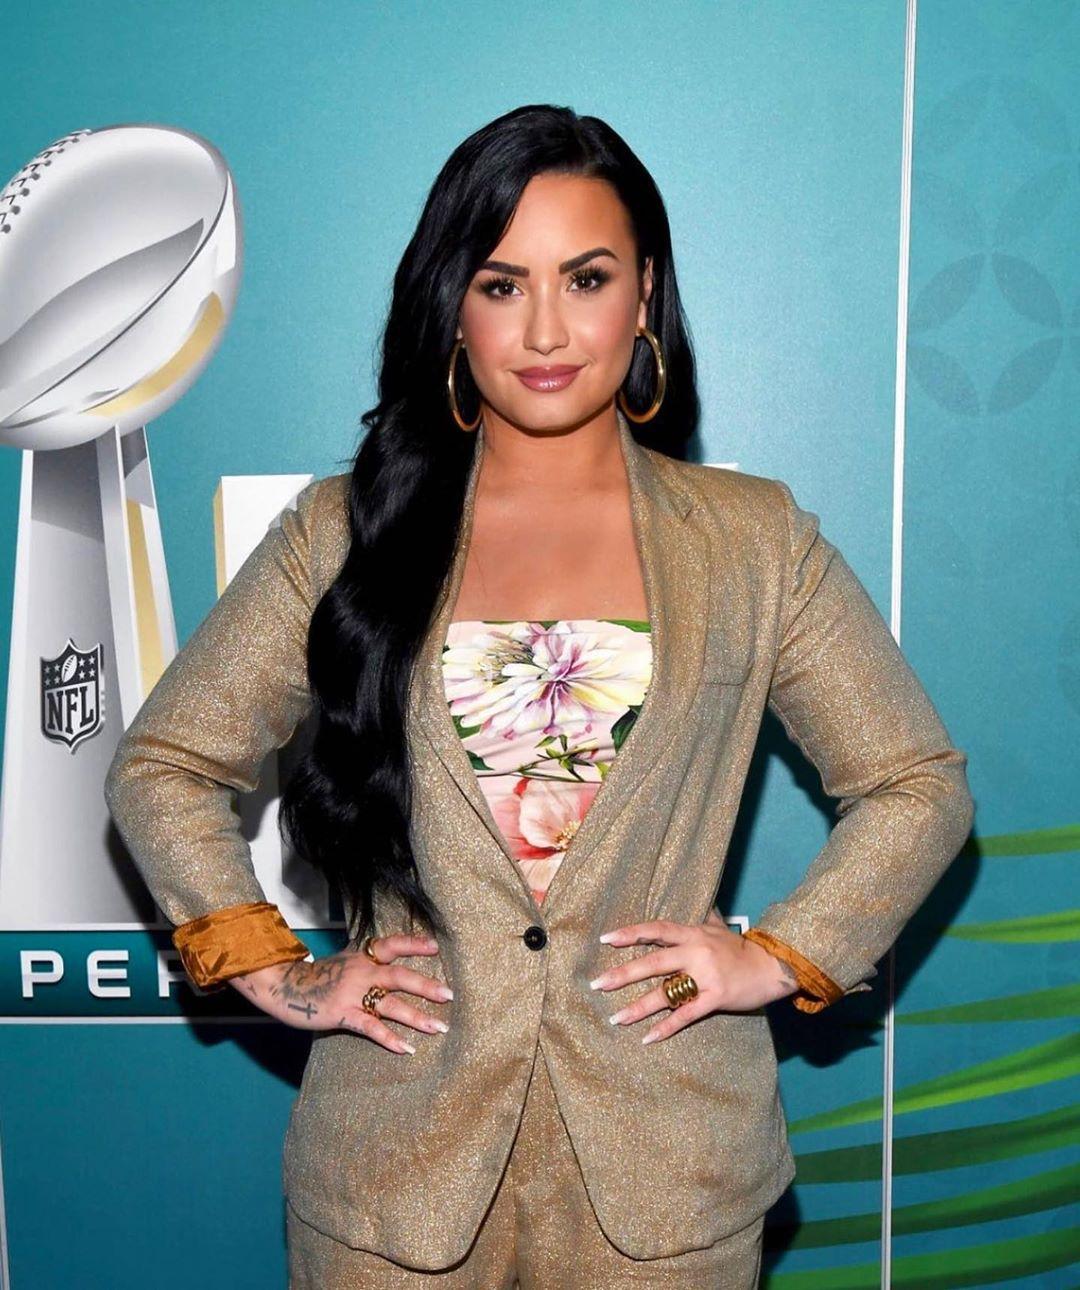 Demi Lovato apoyó a Cyrus durante momentos difíciles (Foto: Instagram@ddlovato)